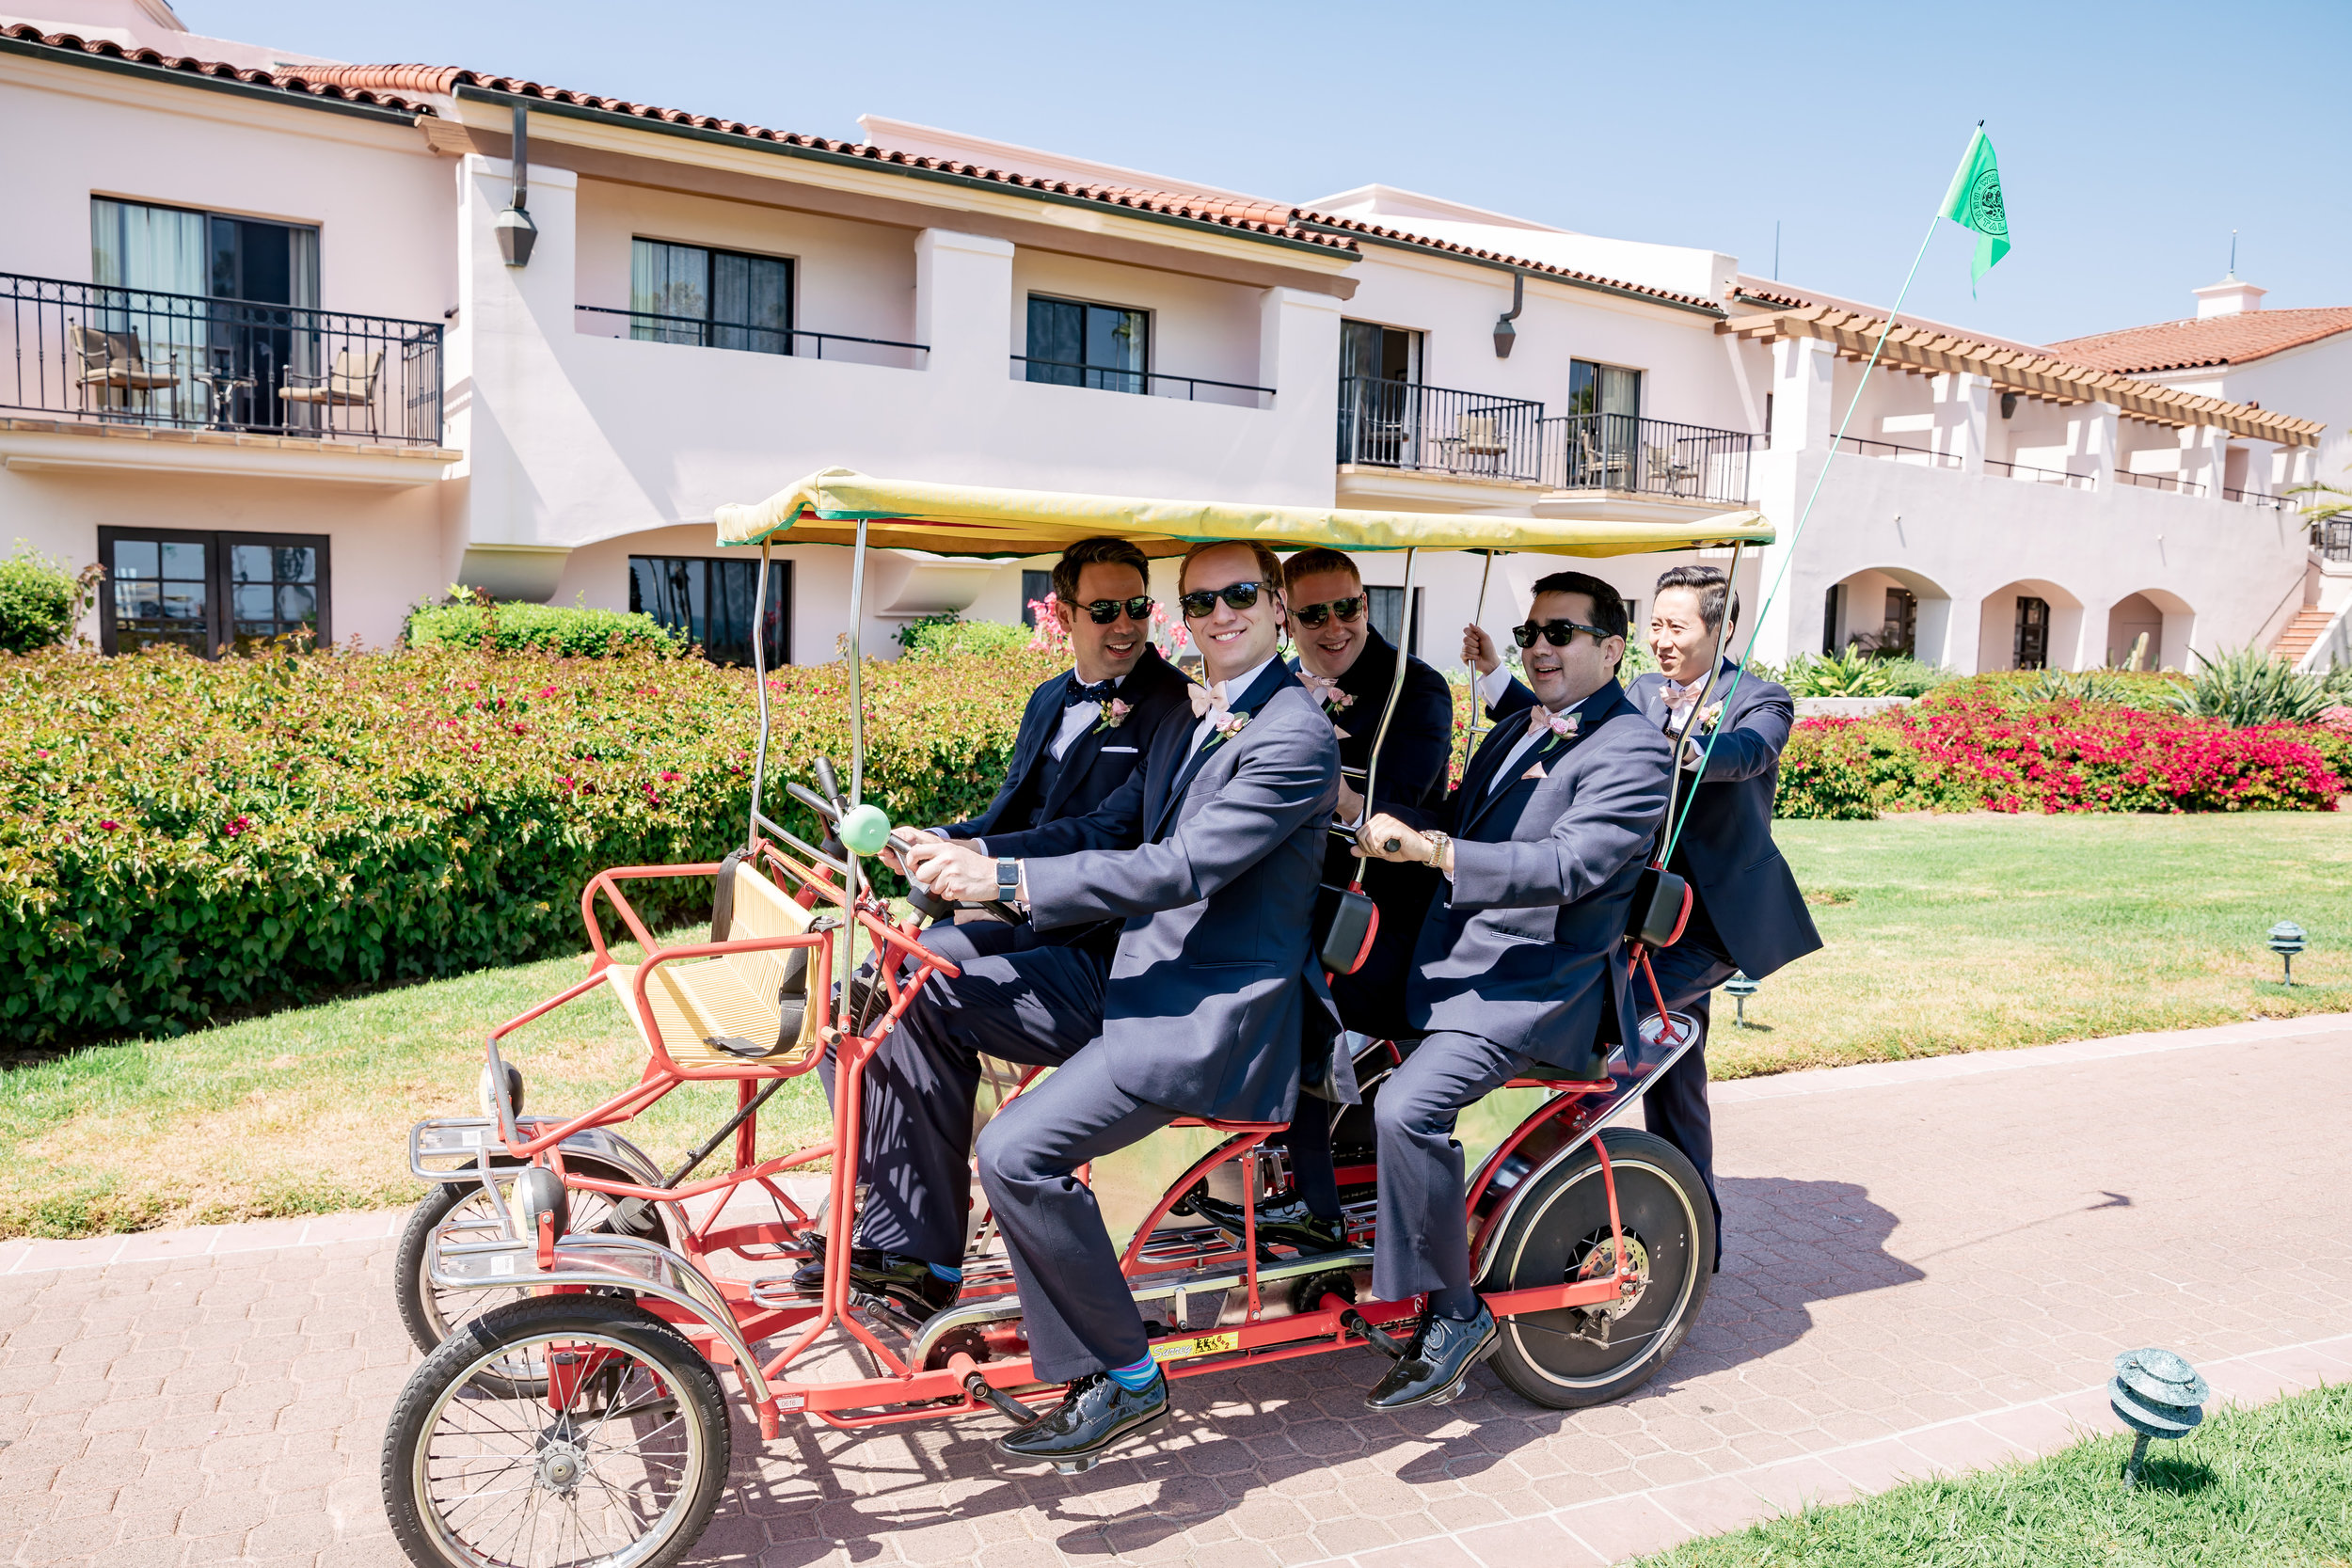 www.santabarbarawedding.com   Rewind Photography   Hilton Santa Barbara Beachfront Resort   Events by M and M   Groomsmen